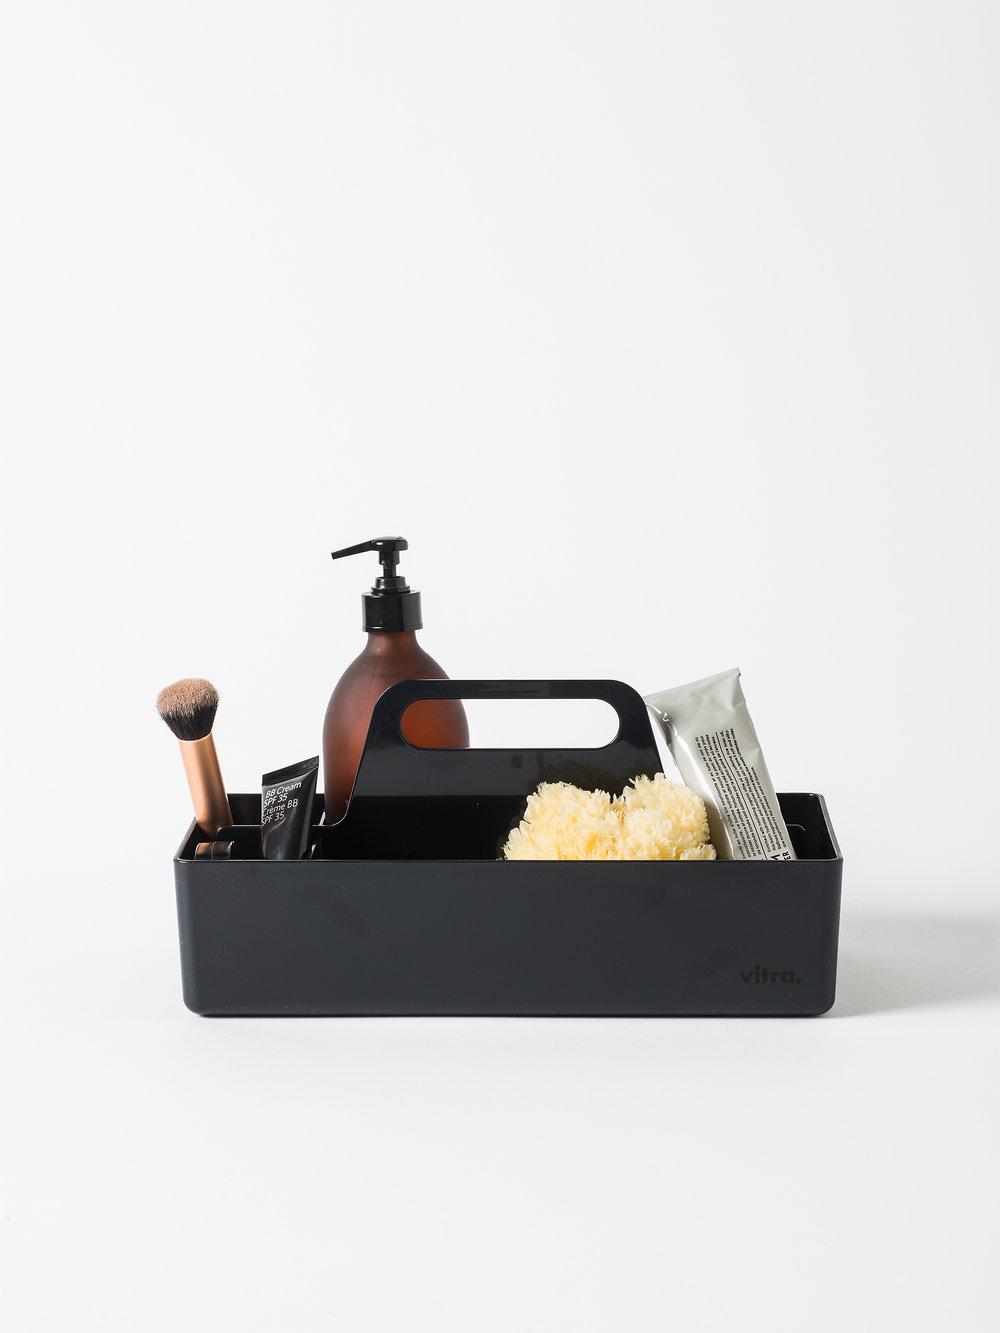 Vitra Toolbox - Black $59.90